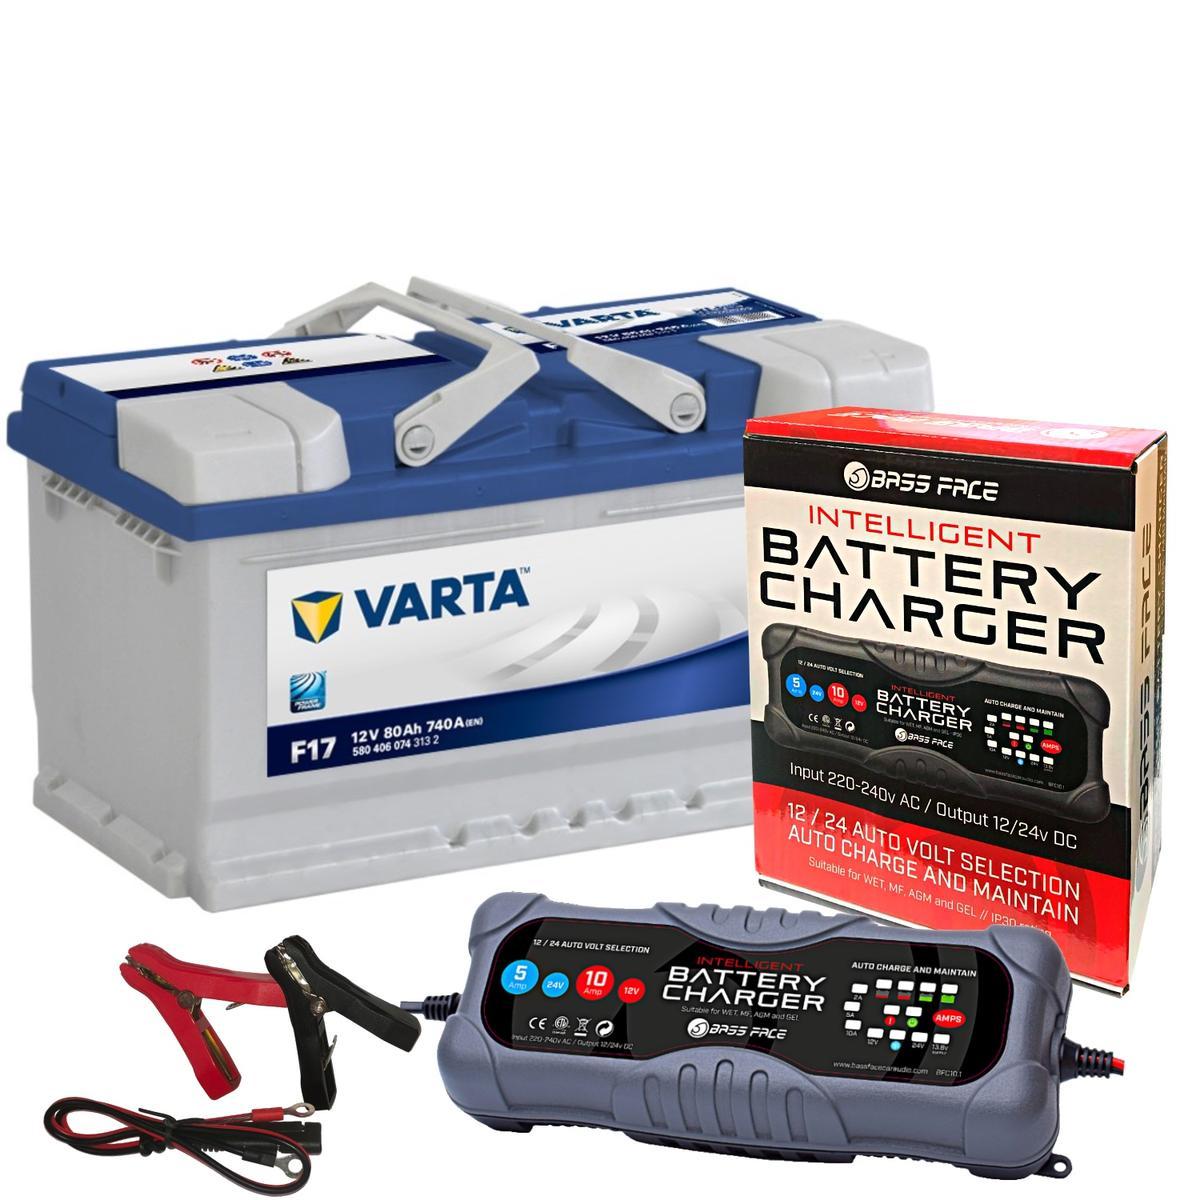 Varta F17 Vaux Porsche Car Battery 12v 4 Year 110 80Ah 740CCA W/ 10 Amp Charger